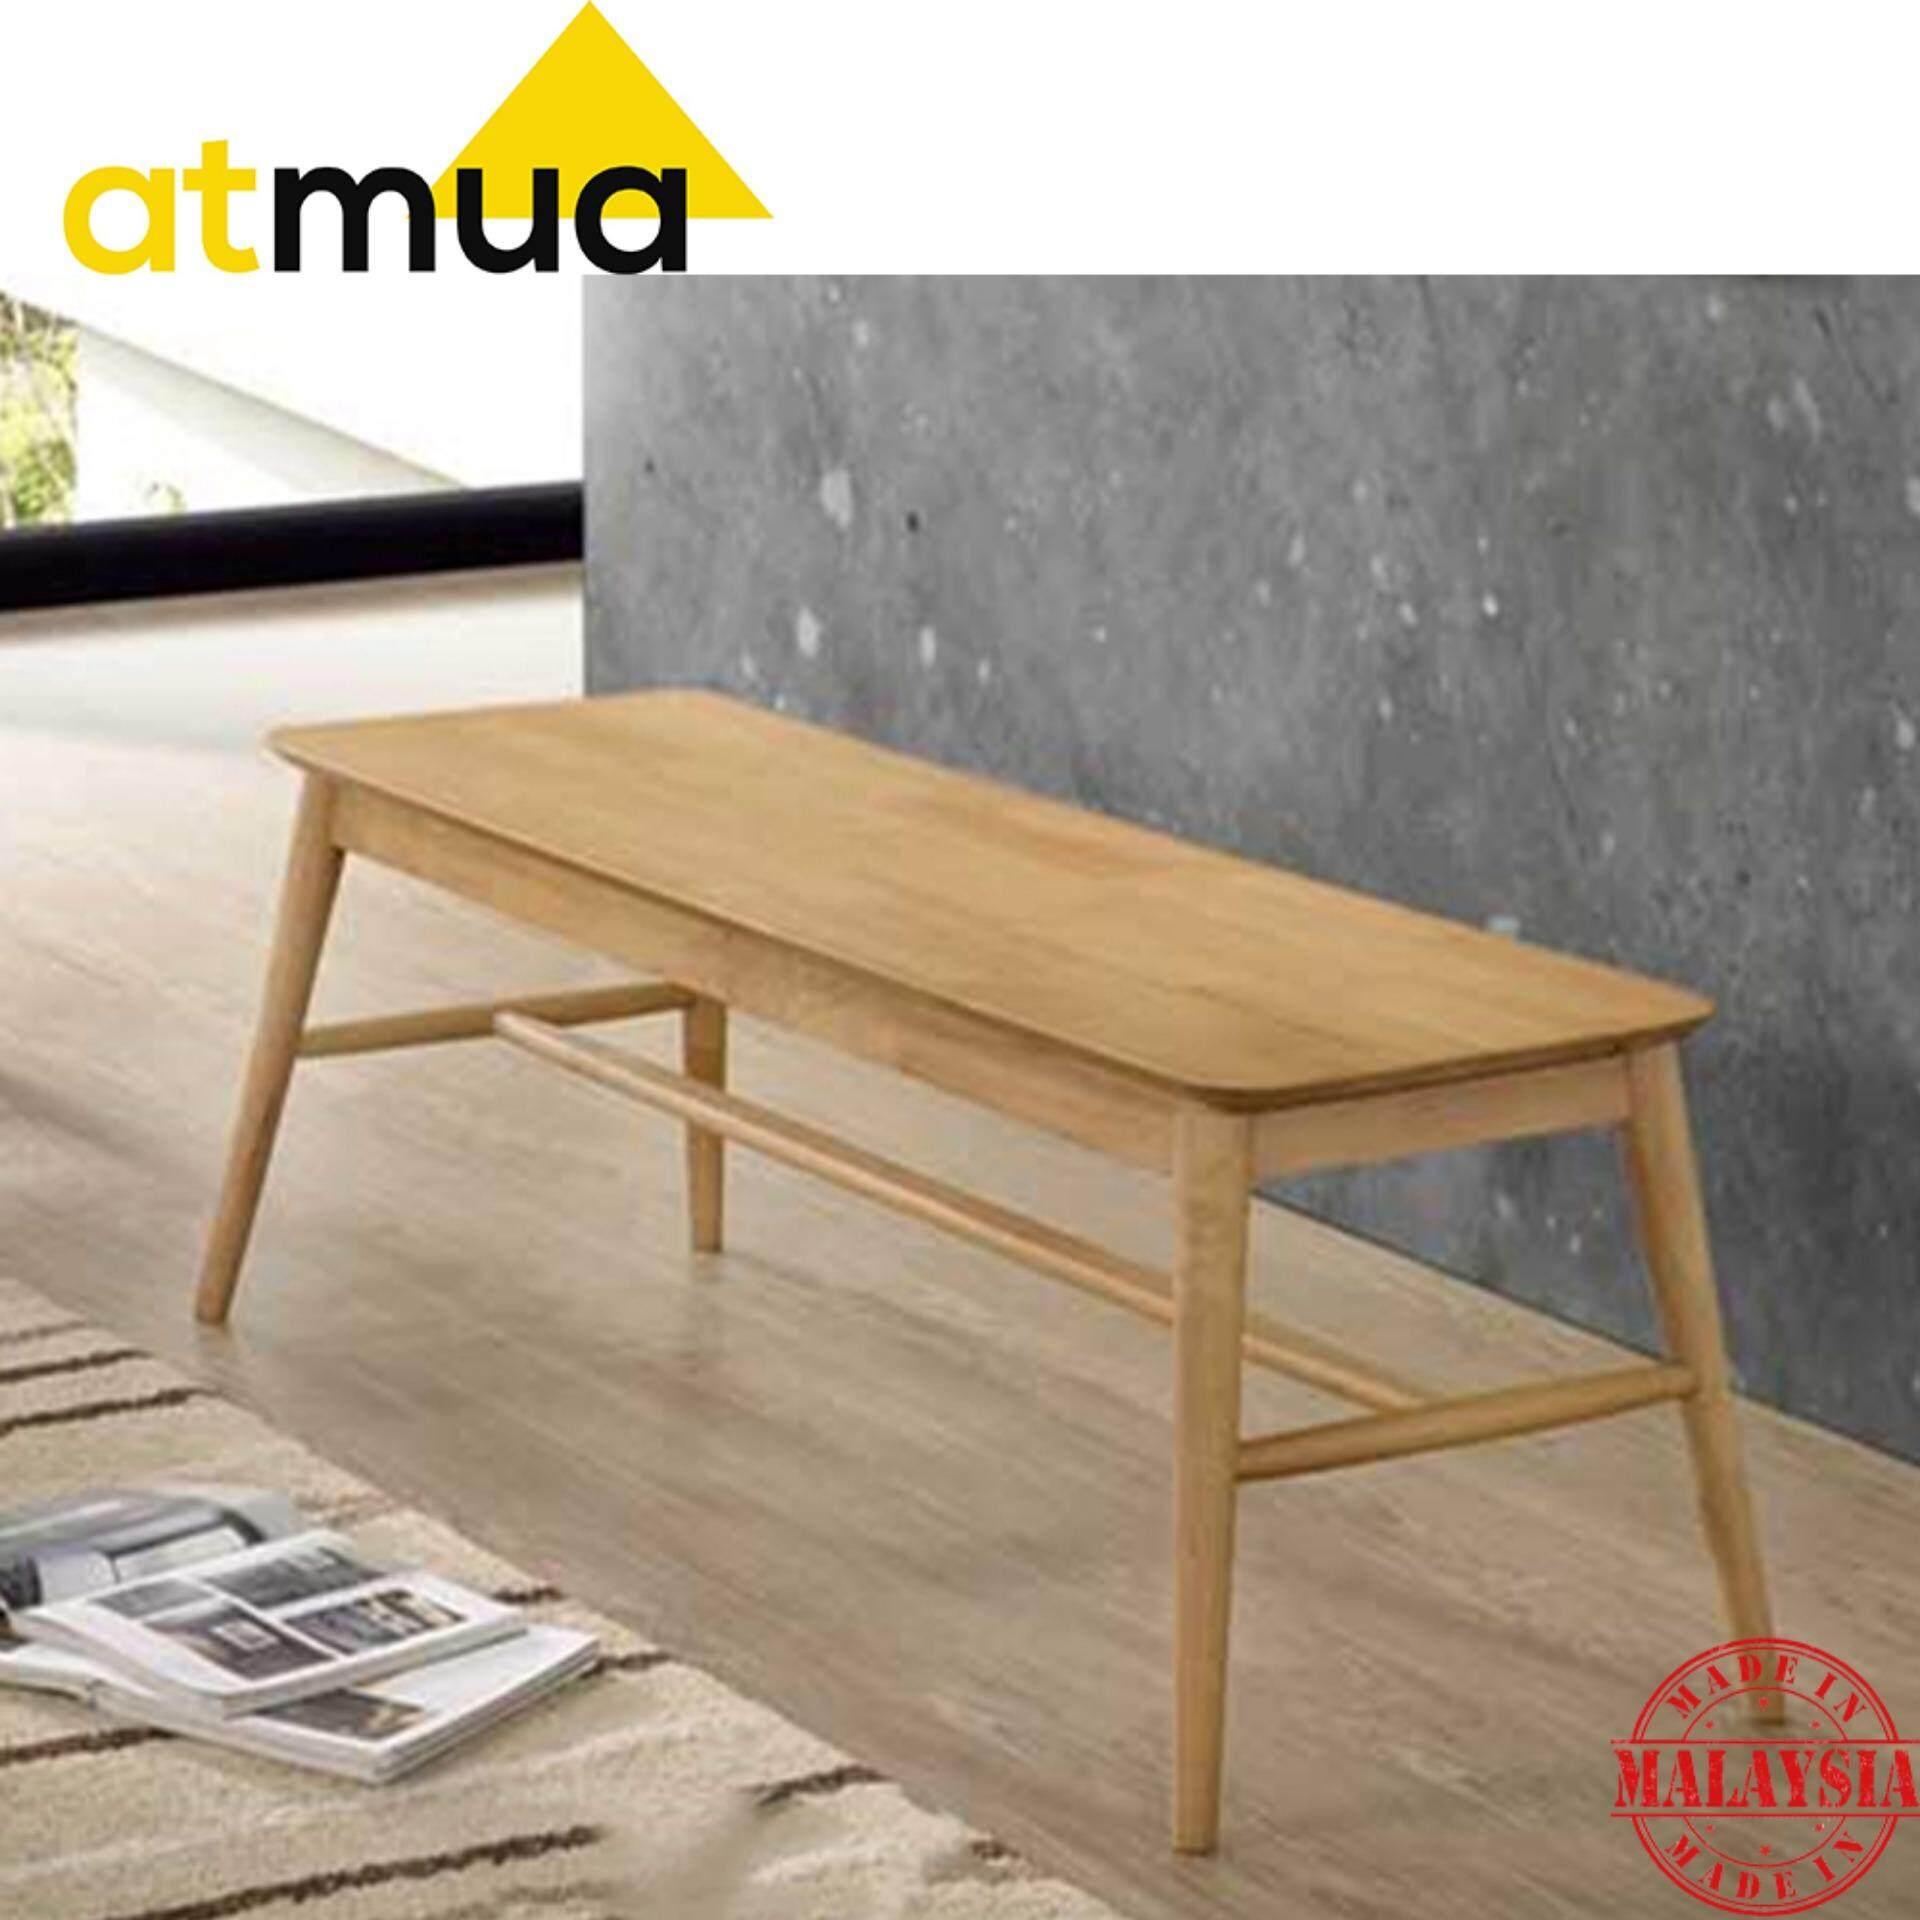 Atmua Gordon Scandinavian Bench Chair Dining Chair [Full Solid Rubber Wood]